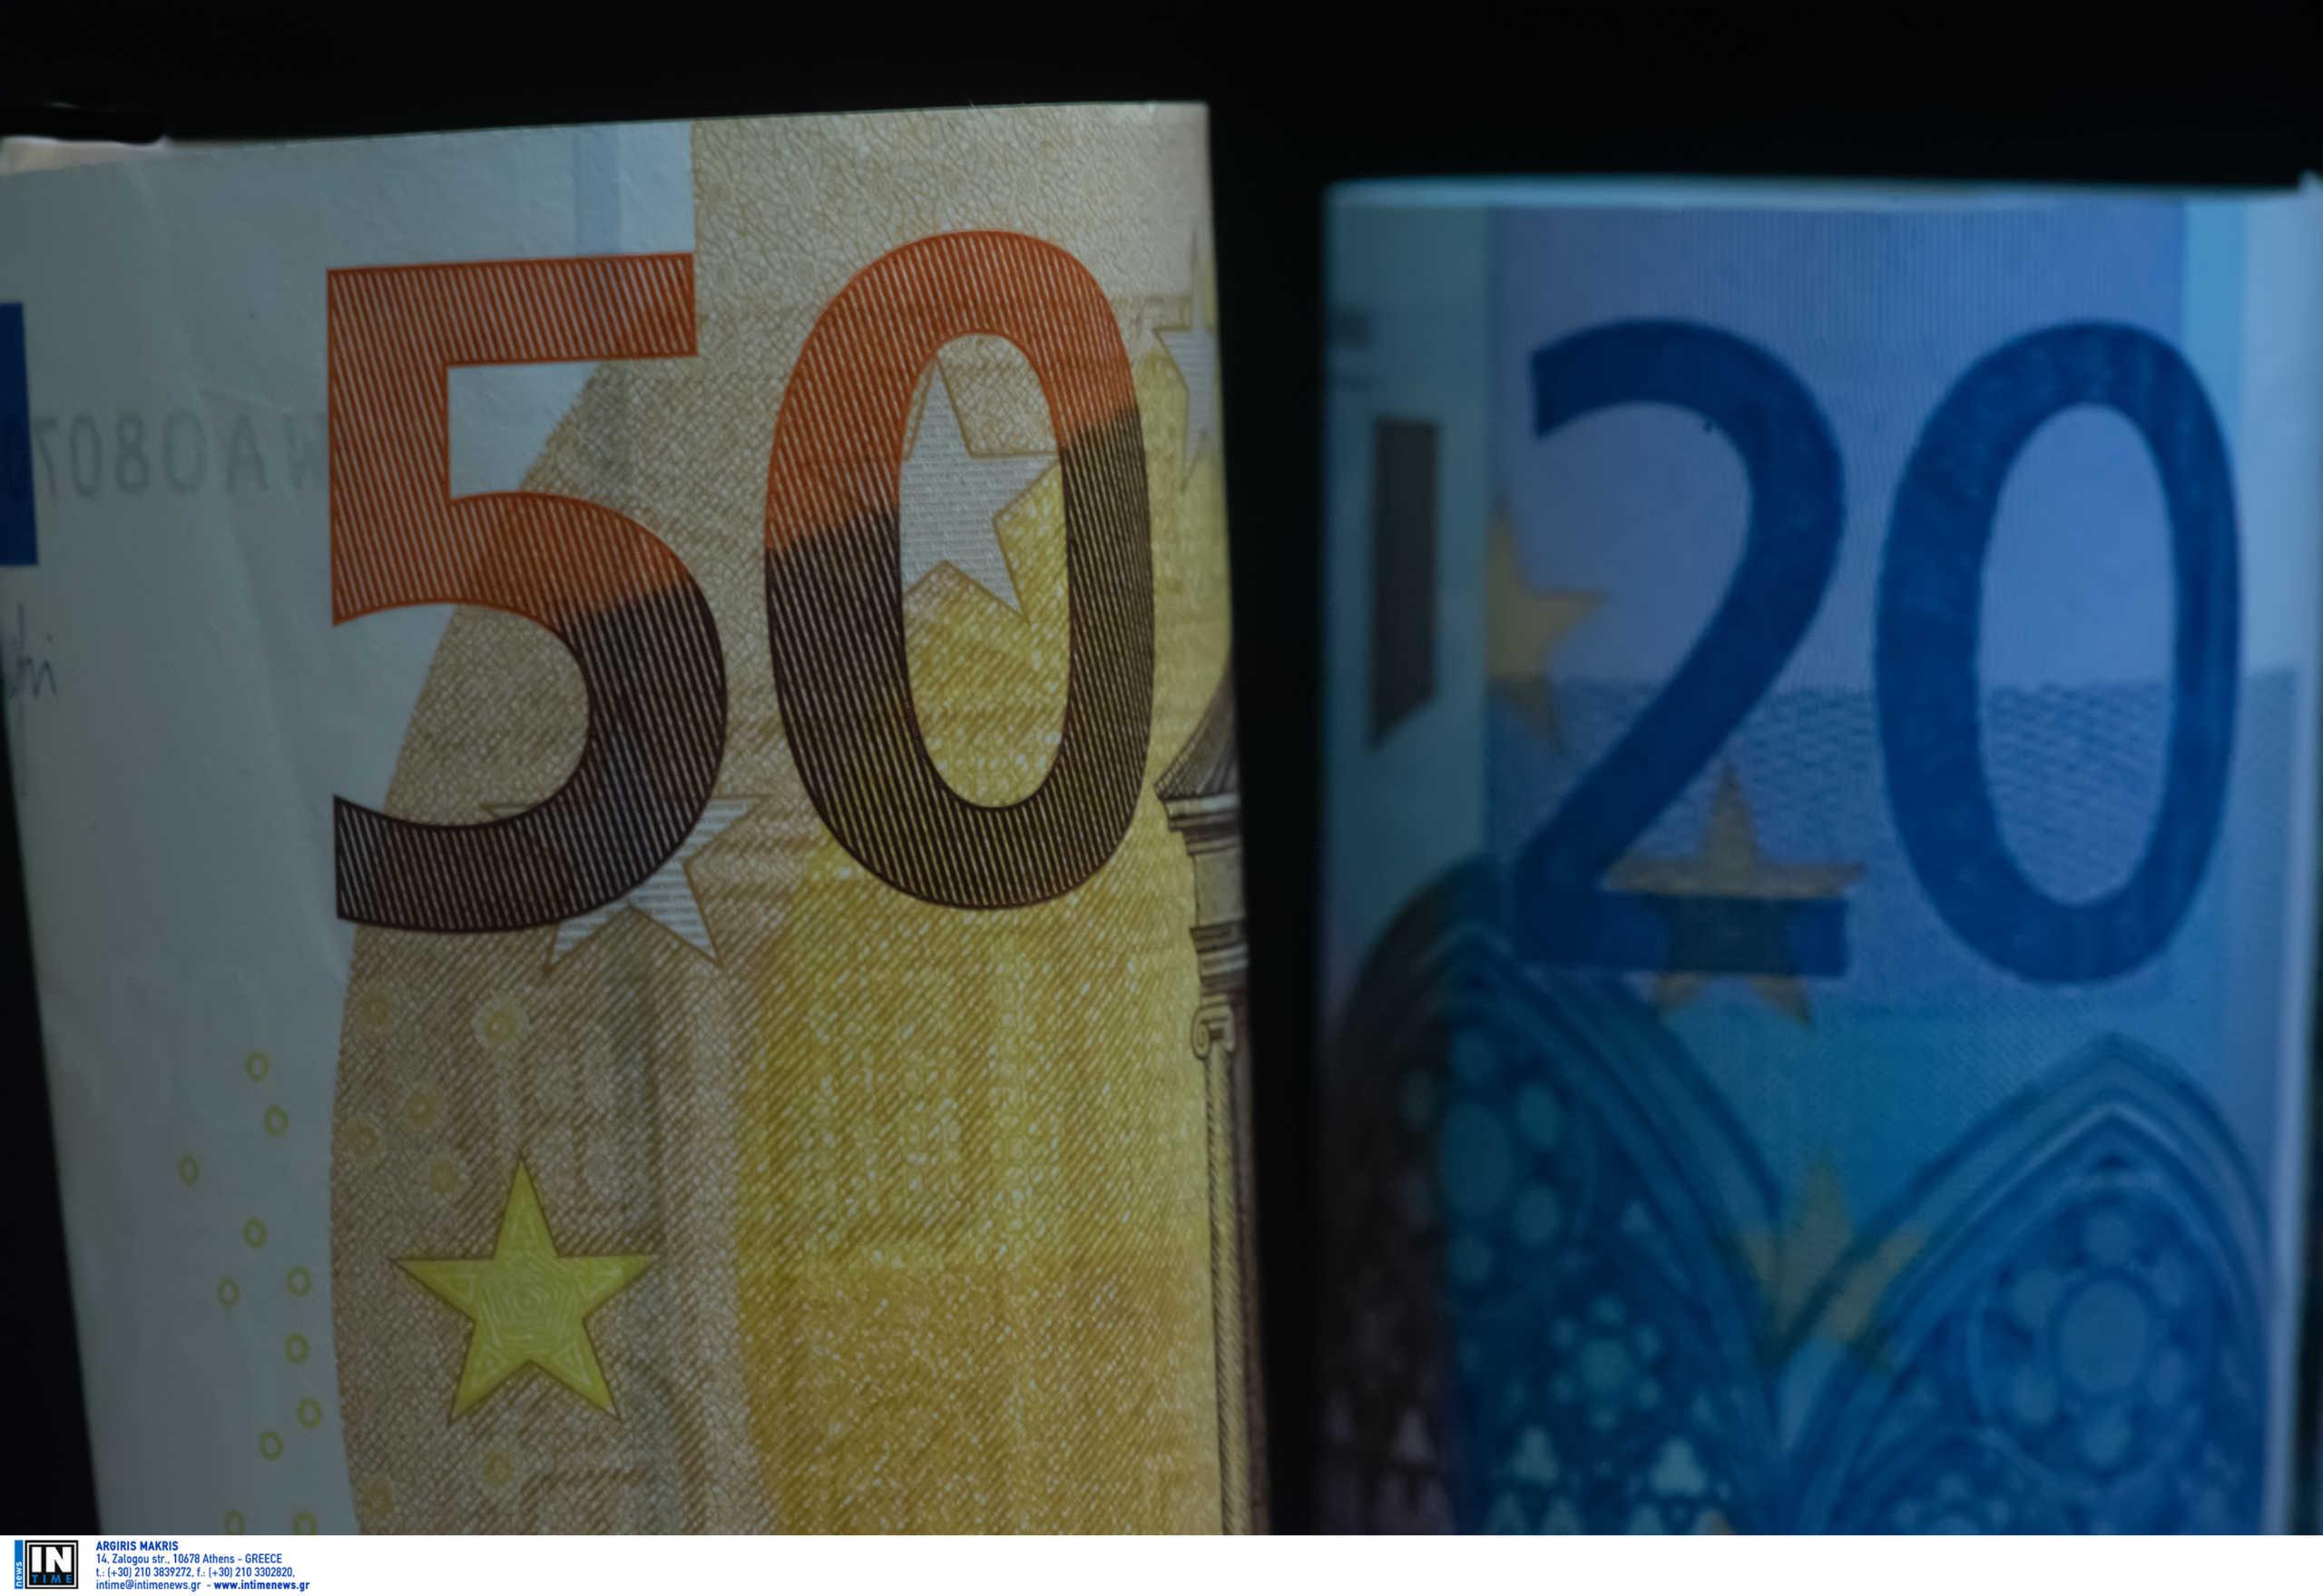 Eurostat: Ανέβηκε 0,9% ο πληθωρισμός τον Ιανουάριο στην Ευρωζώνη